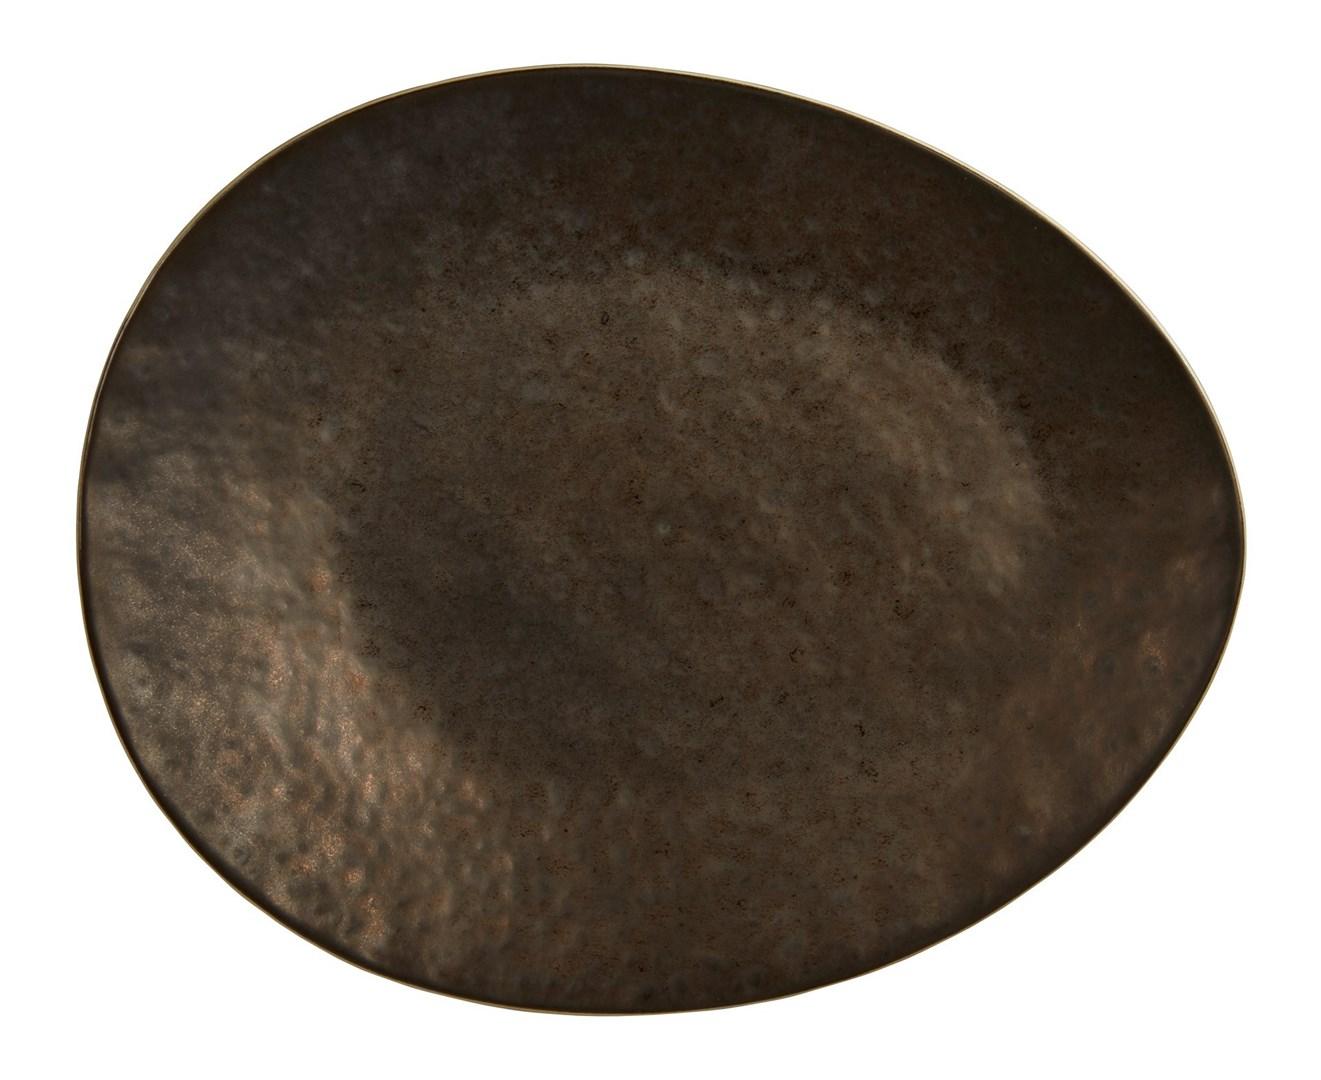 Productafbeelding Rustico Aztec ovaal bord 27 cm